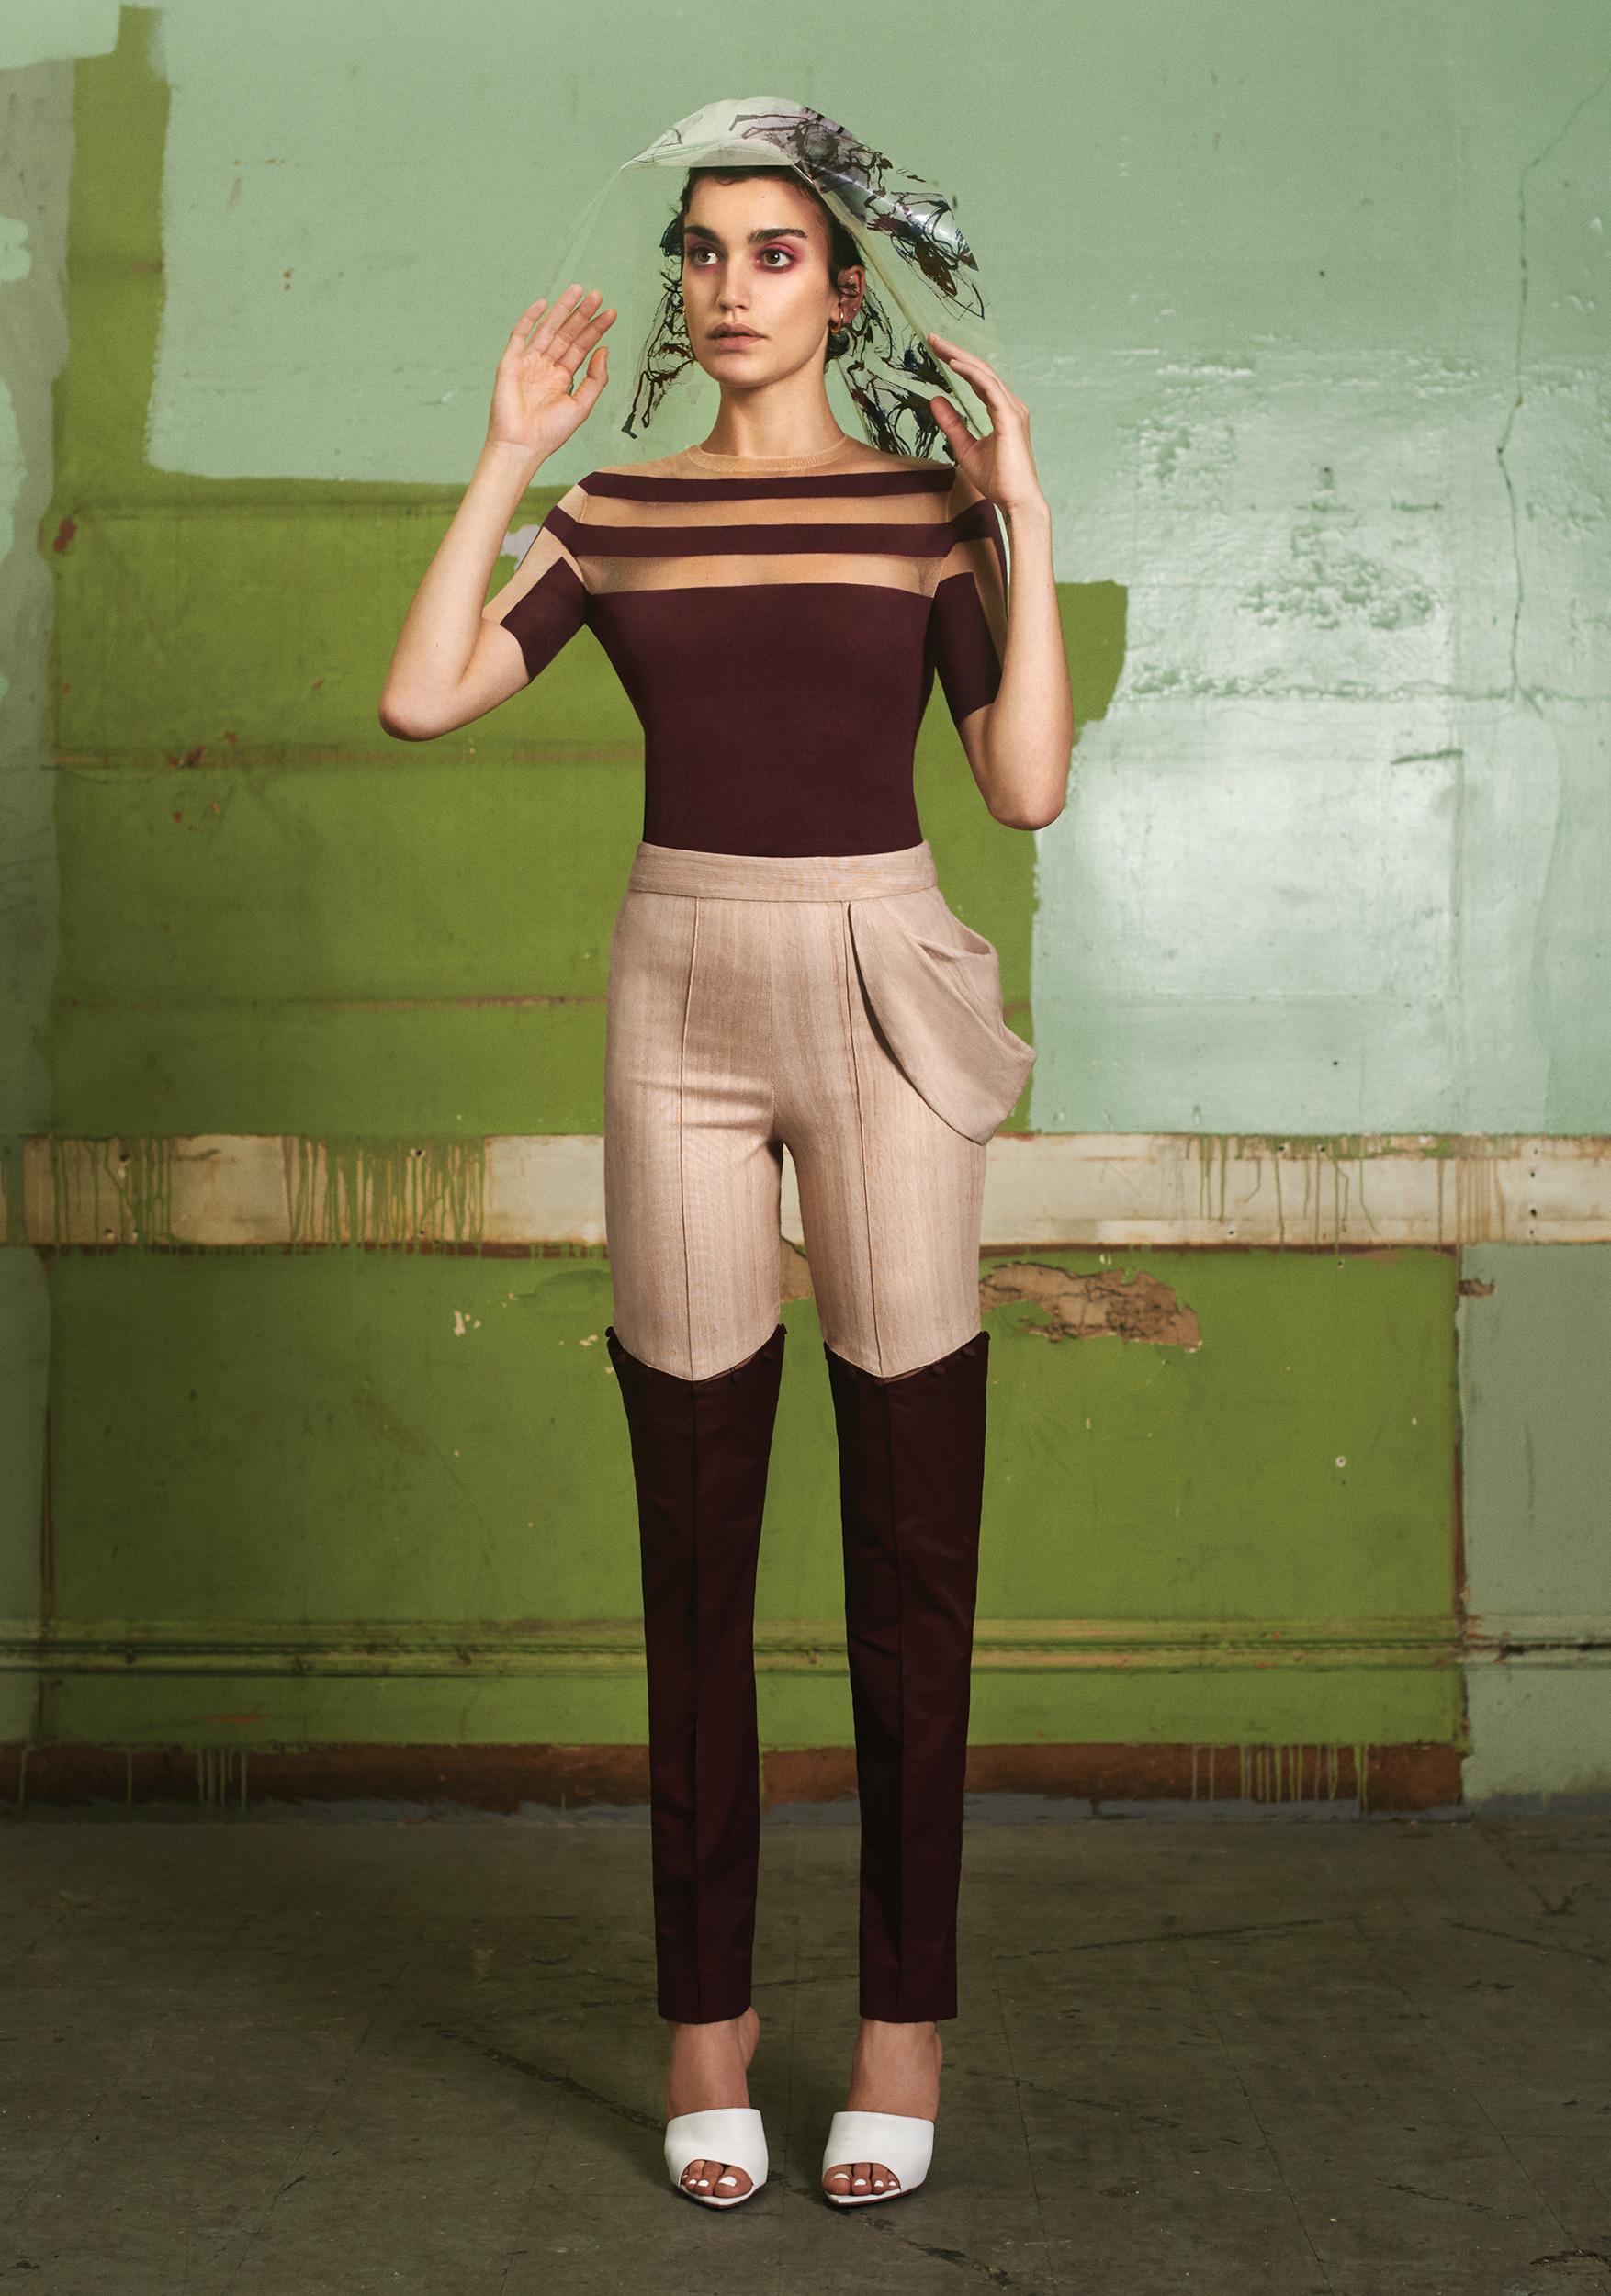 JULIANNA-BASS-SS19-06-Ryan-Sweater-Kari-Hinge-Trouser.jpg